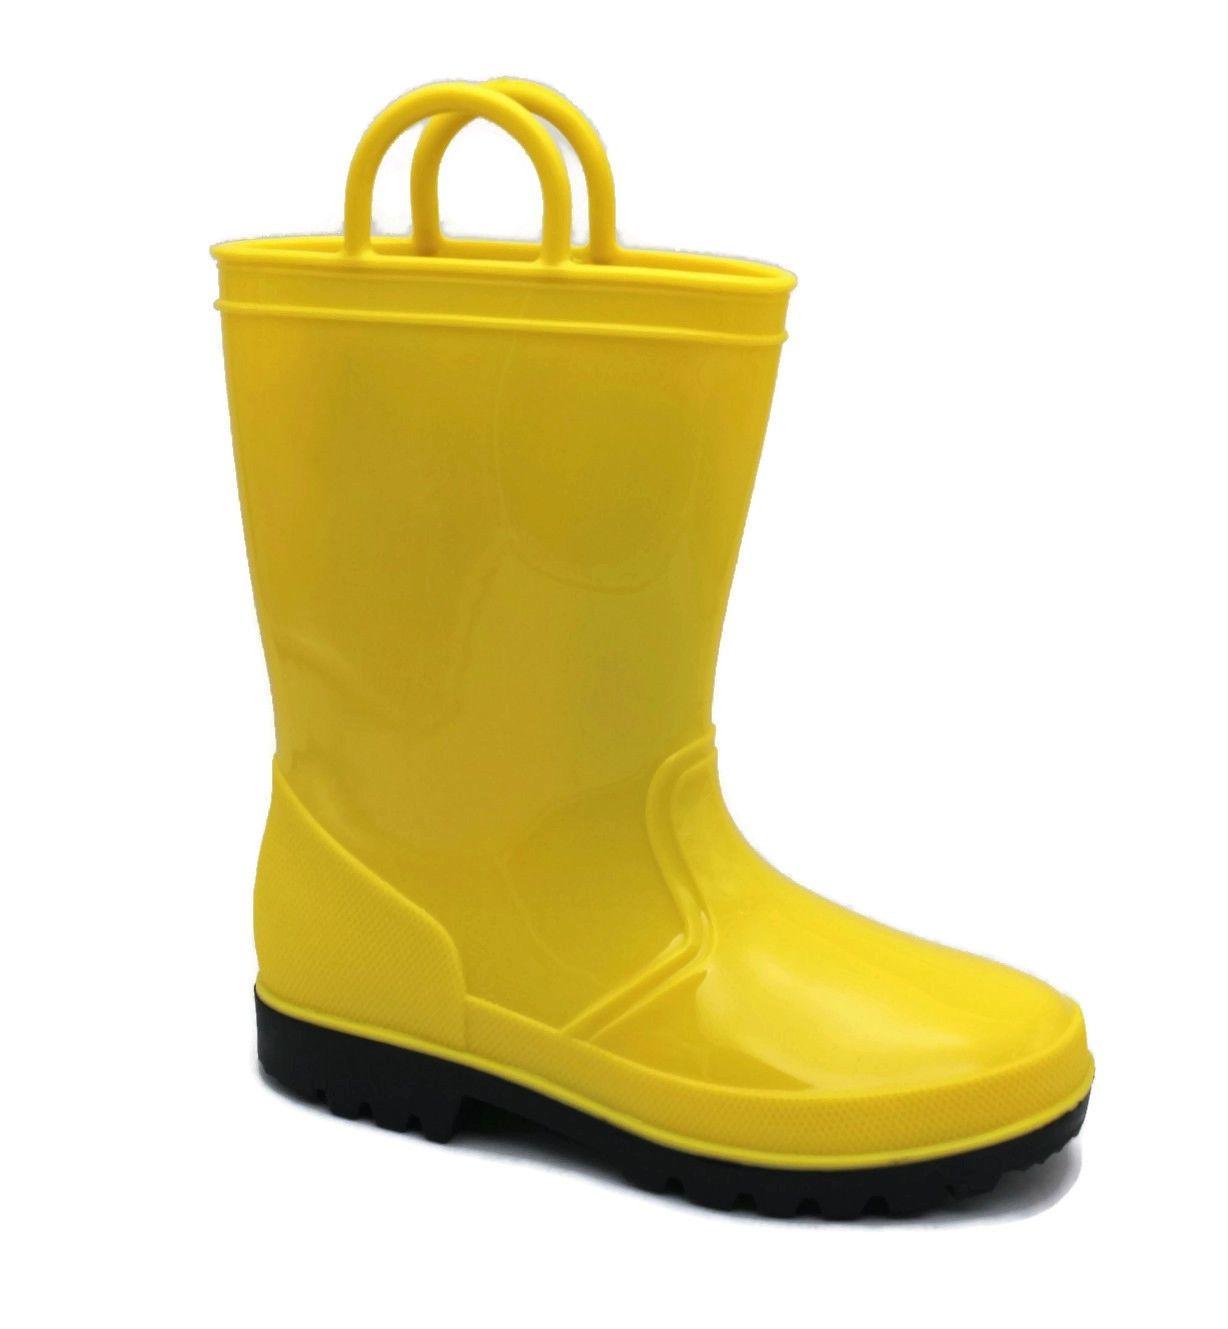 Toddler 5 to Big Kid 6 Girls or Boys WATERPROOF Skadoo KIDS RAIN BOOTS